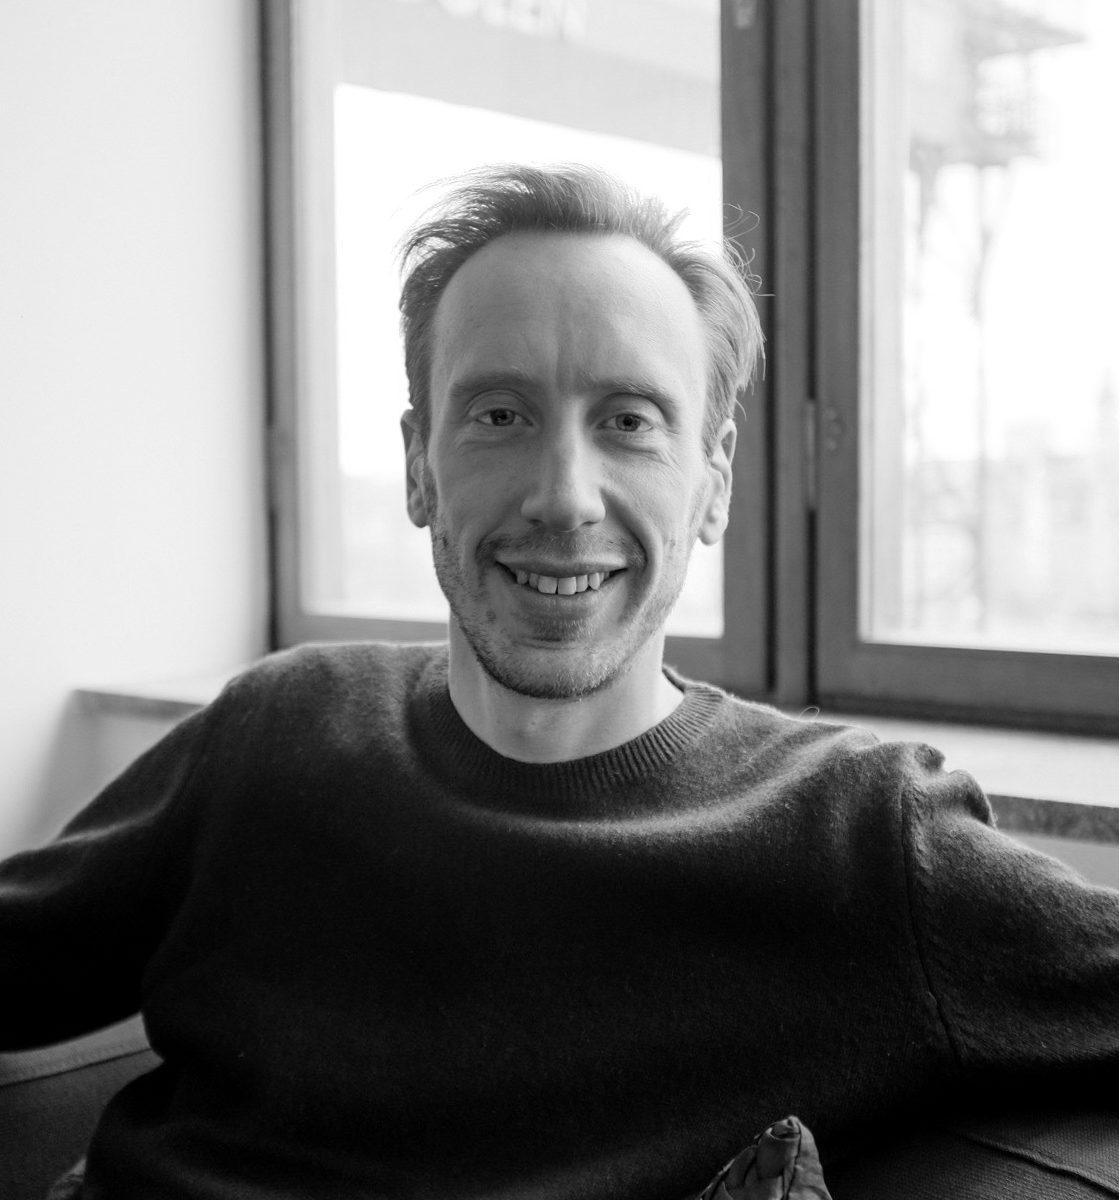 Christian Söderholm